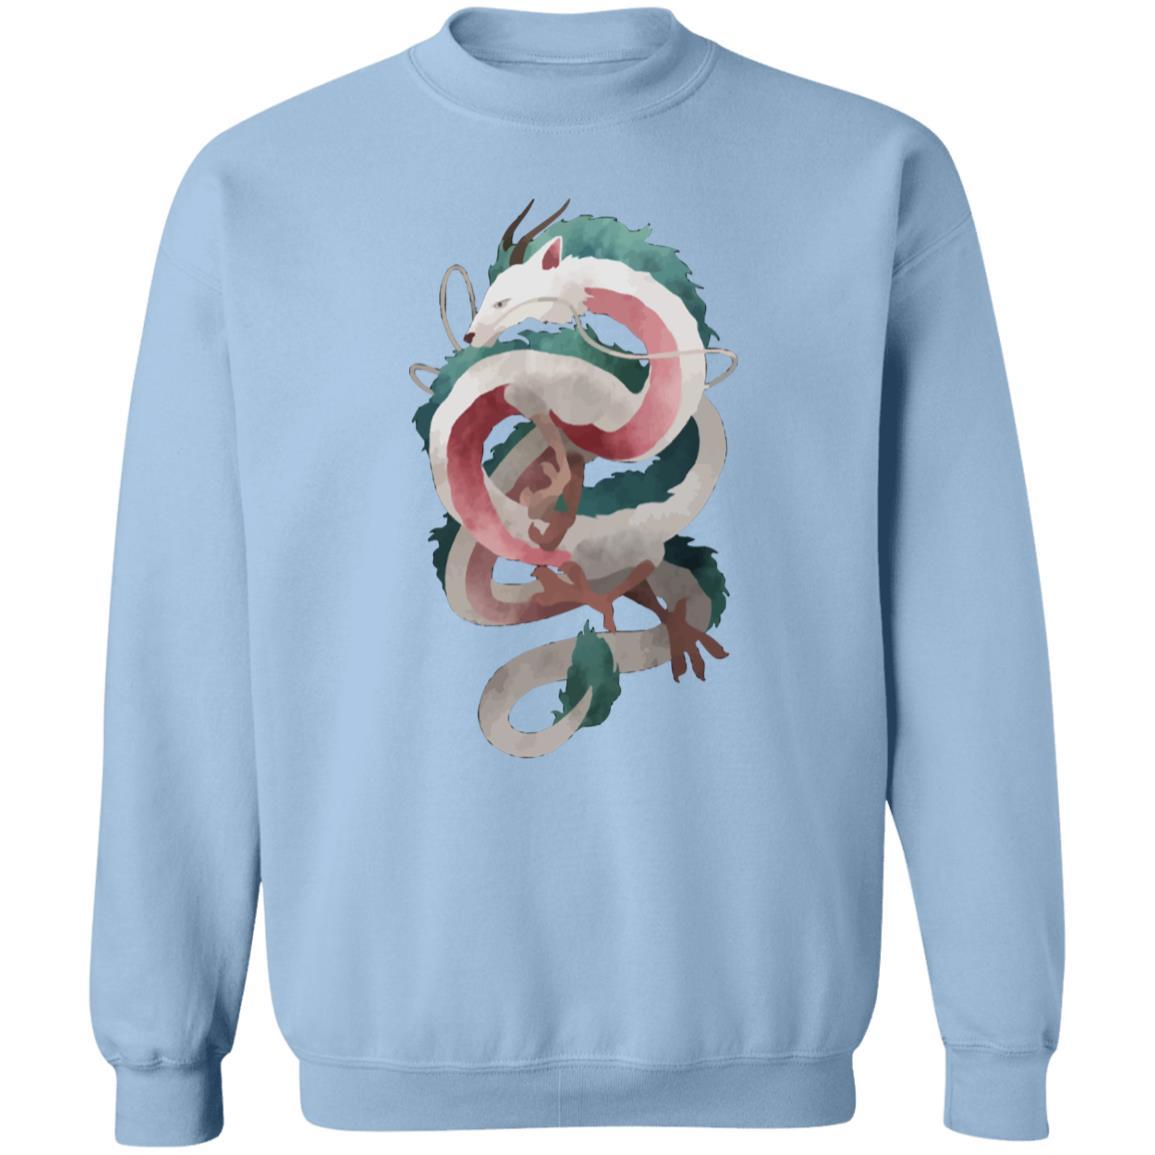 Spirited Away – Haku Dragon Sweatshirt Unisex